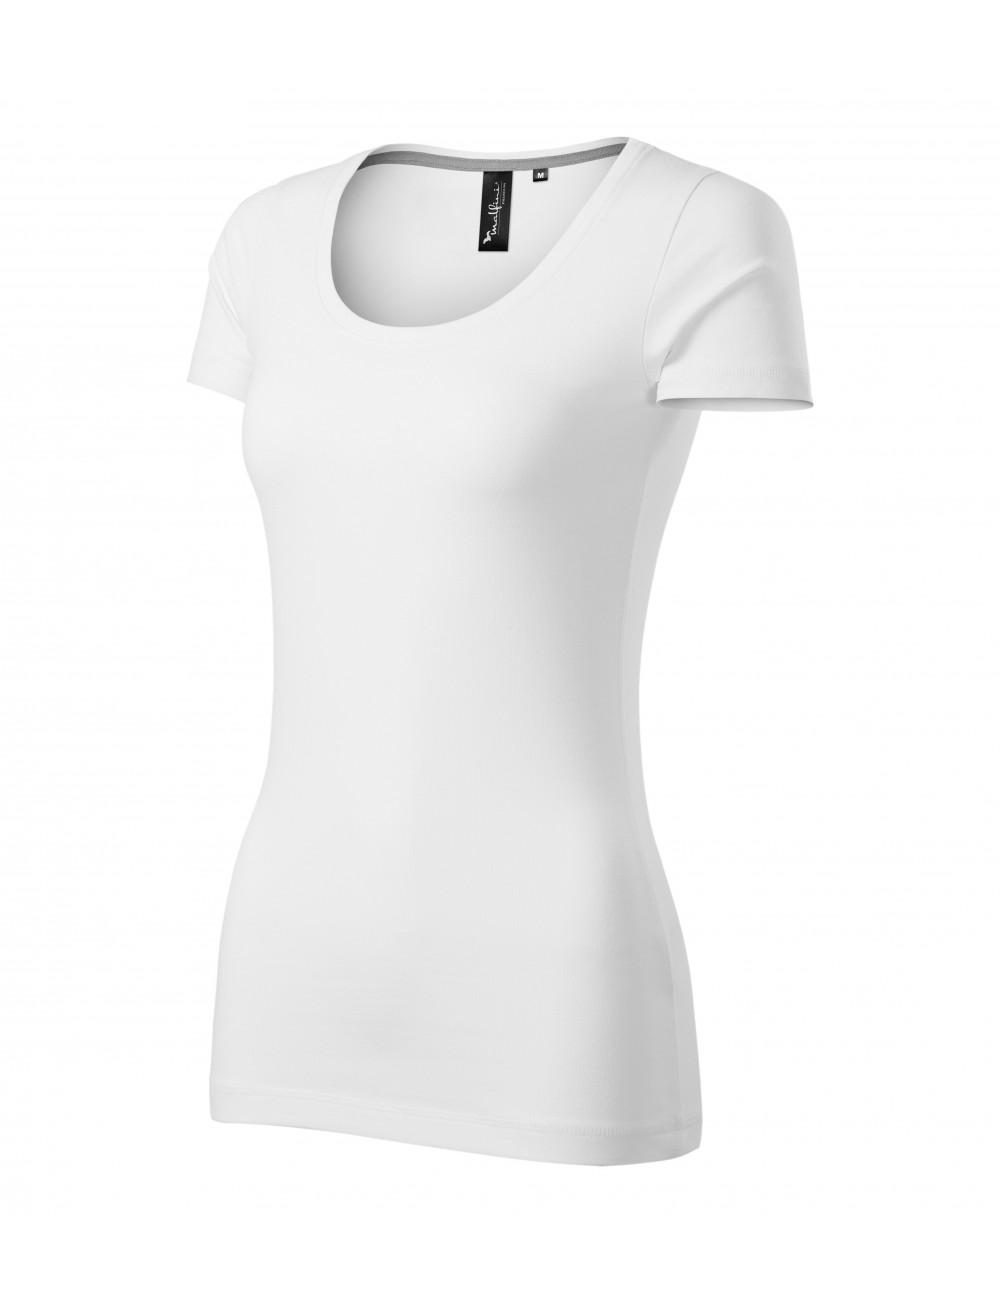 Adler MALFINIPREMIUM Koszulka damska Action 152 biały